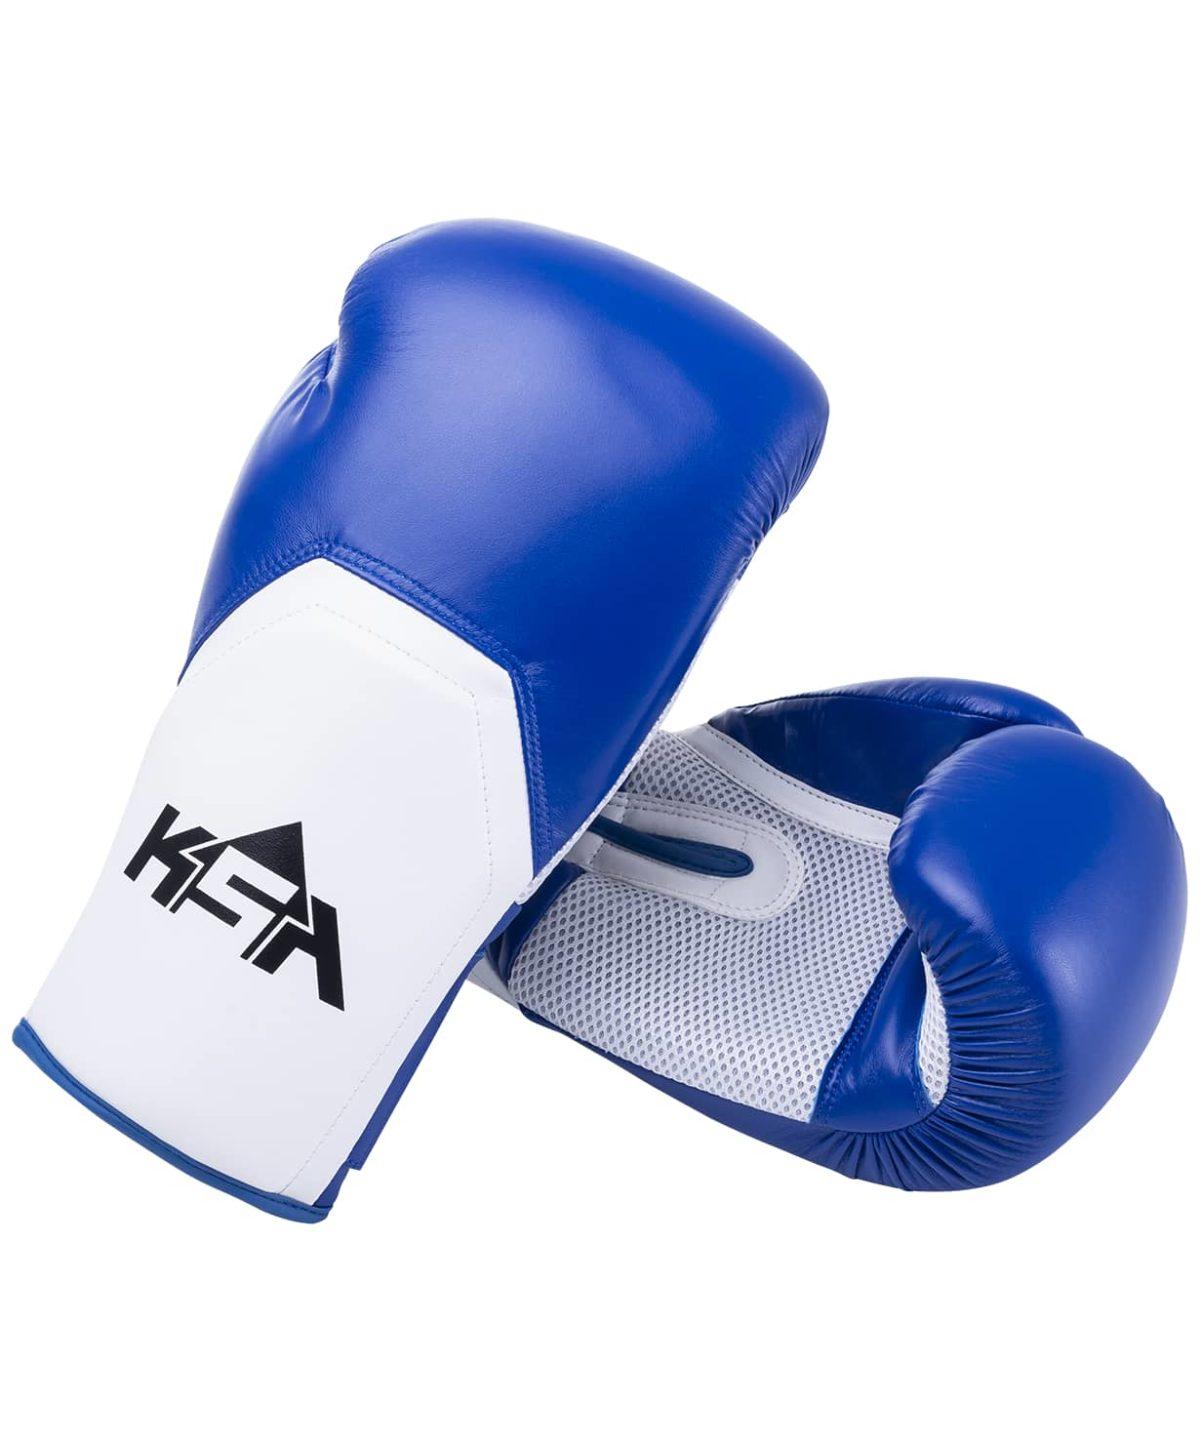 KSA Scorpio Blue Перчатки боксерские, 10 oz, к/з 17818: синий - 1